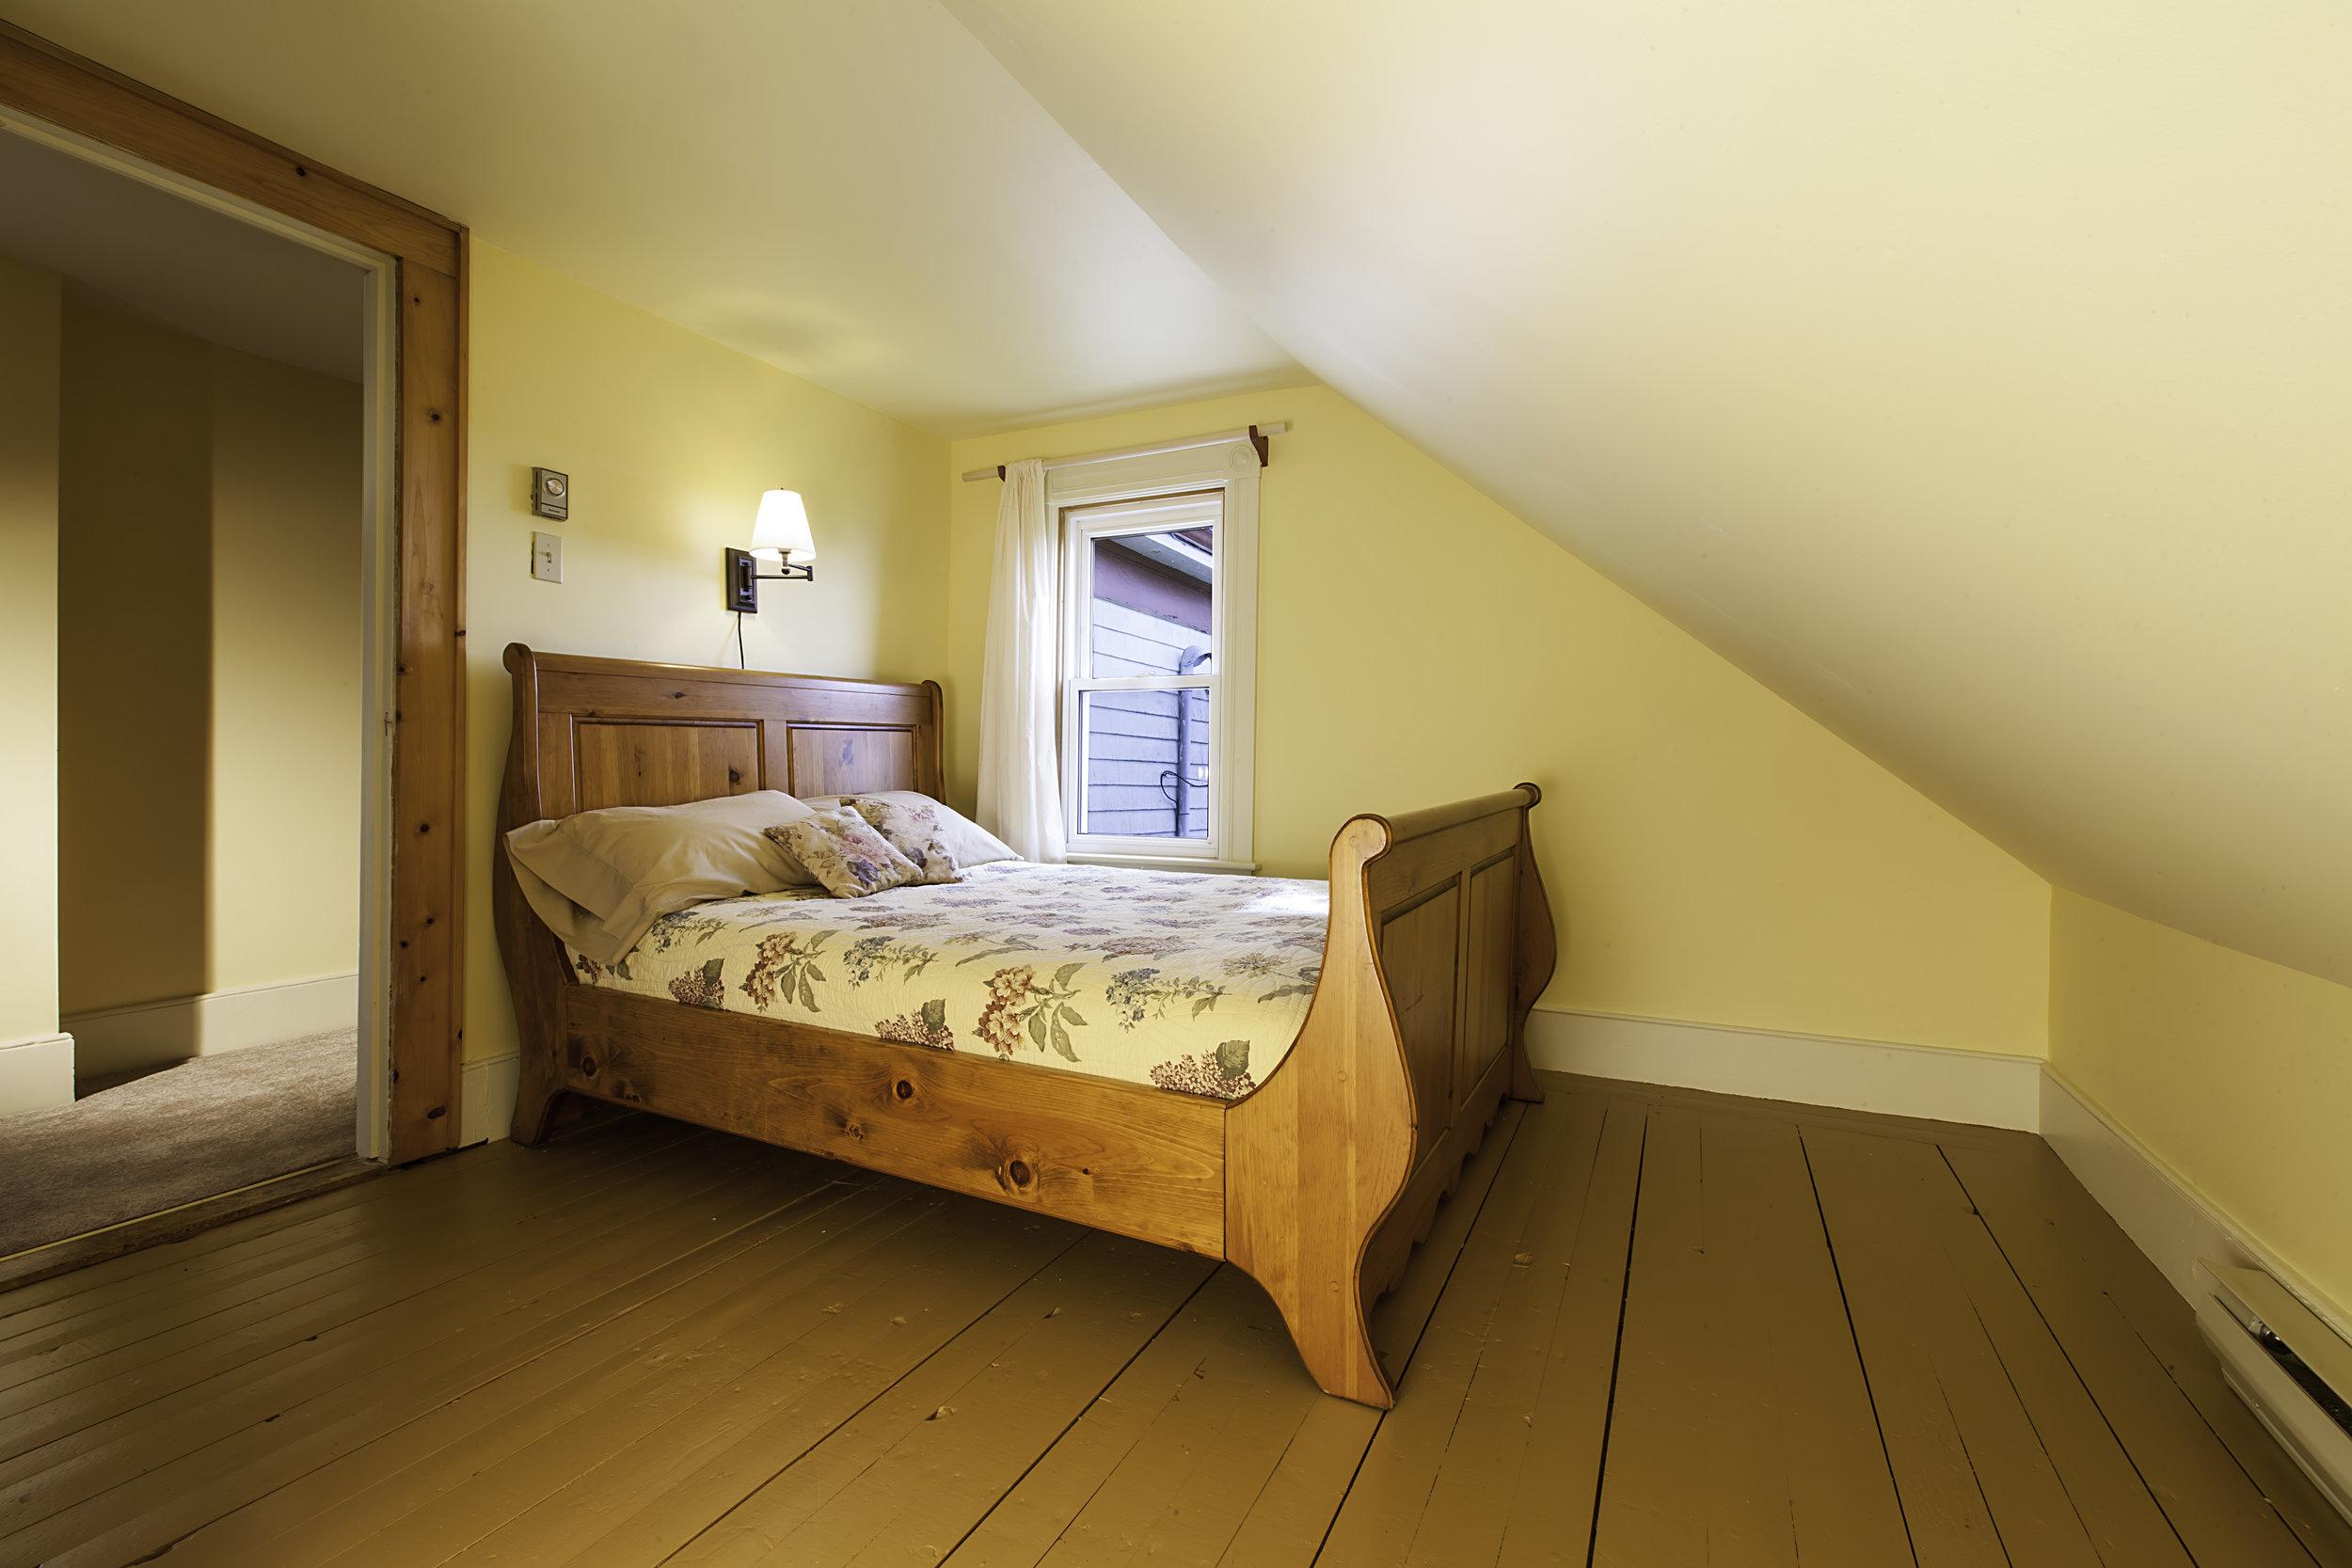 IMG_5530-Small_Bedroom-1.jpg